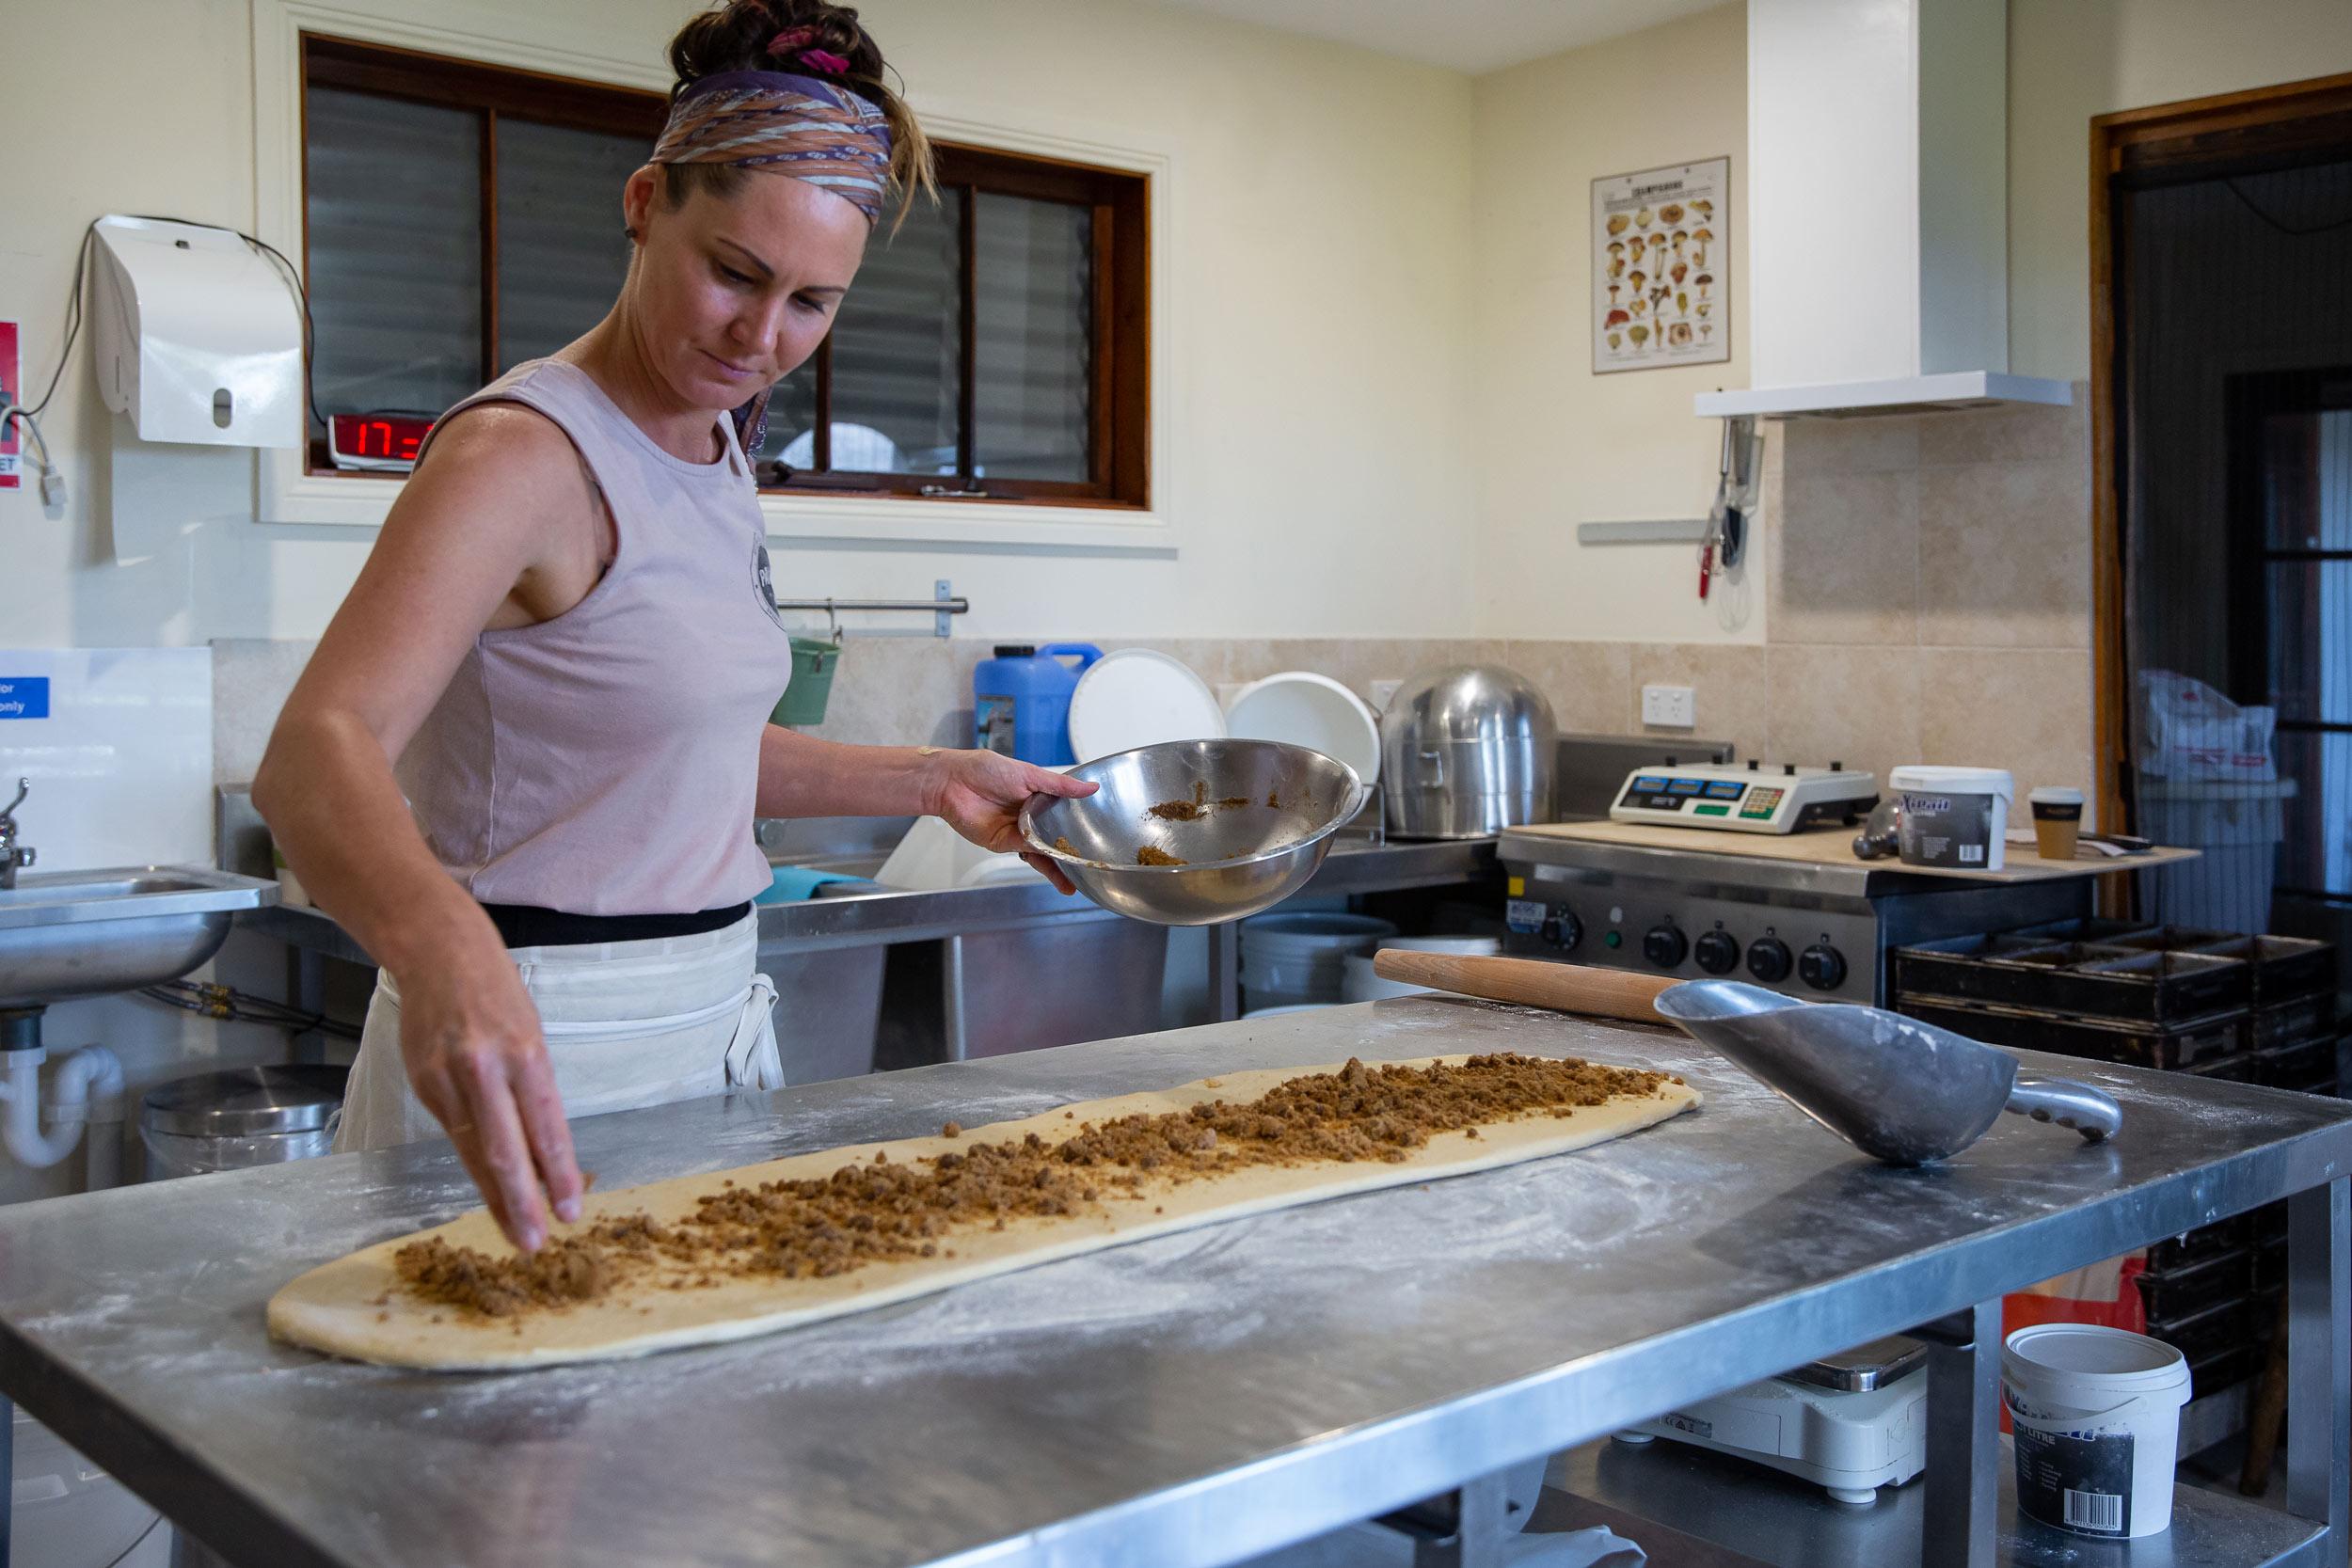 glft-palms-micro-bakery-cinnamon-rolls.jpg